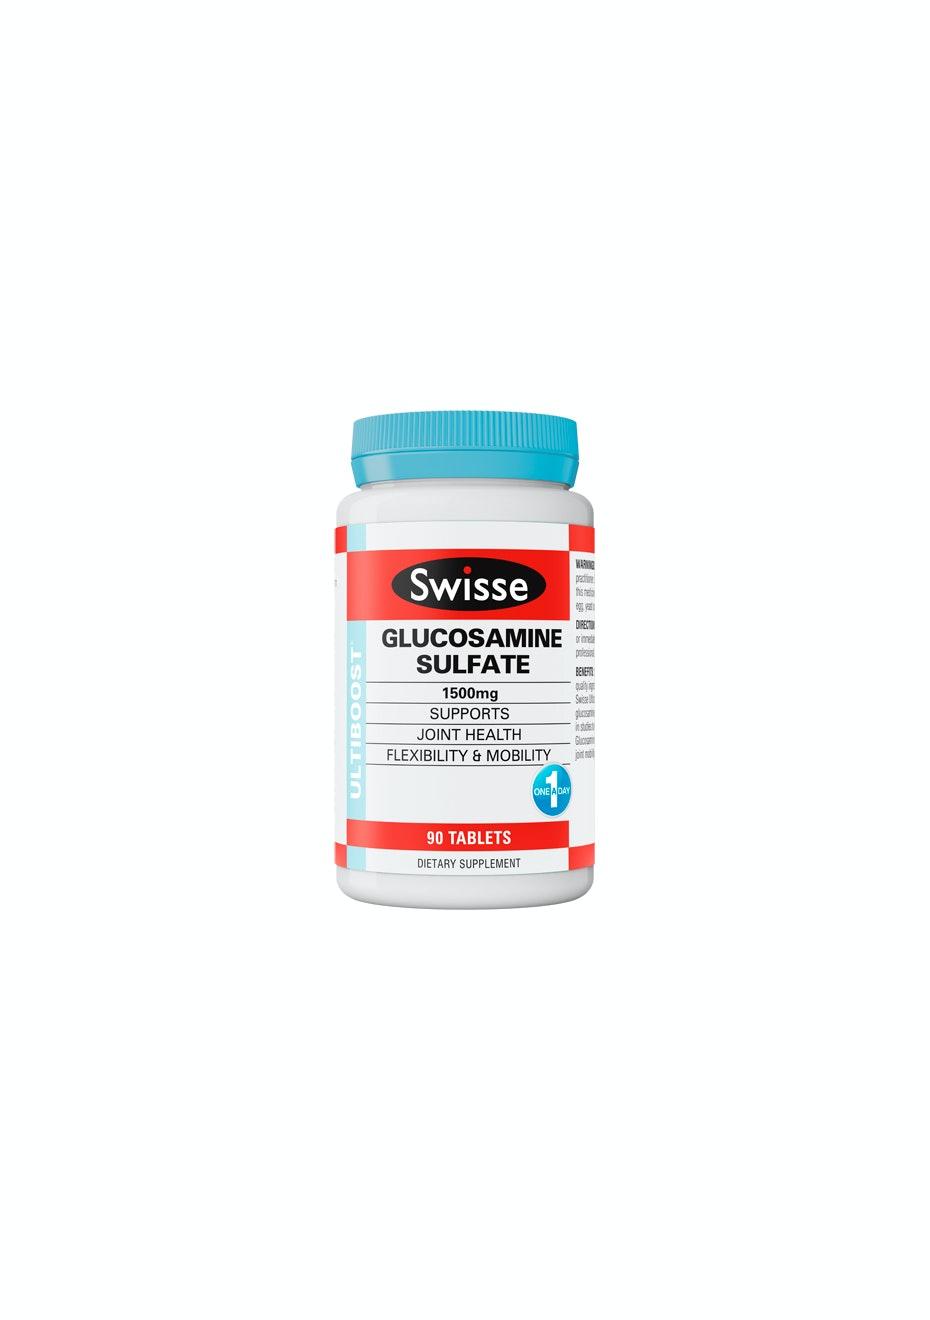 Swisse Ultiboost Glucosamine Sulfate 90 Tabs